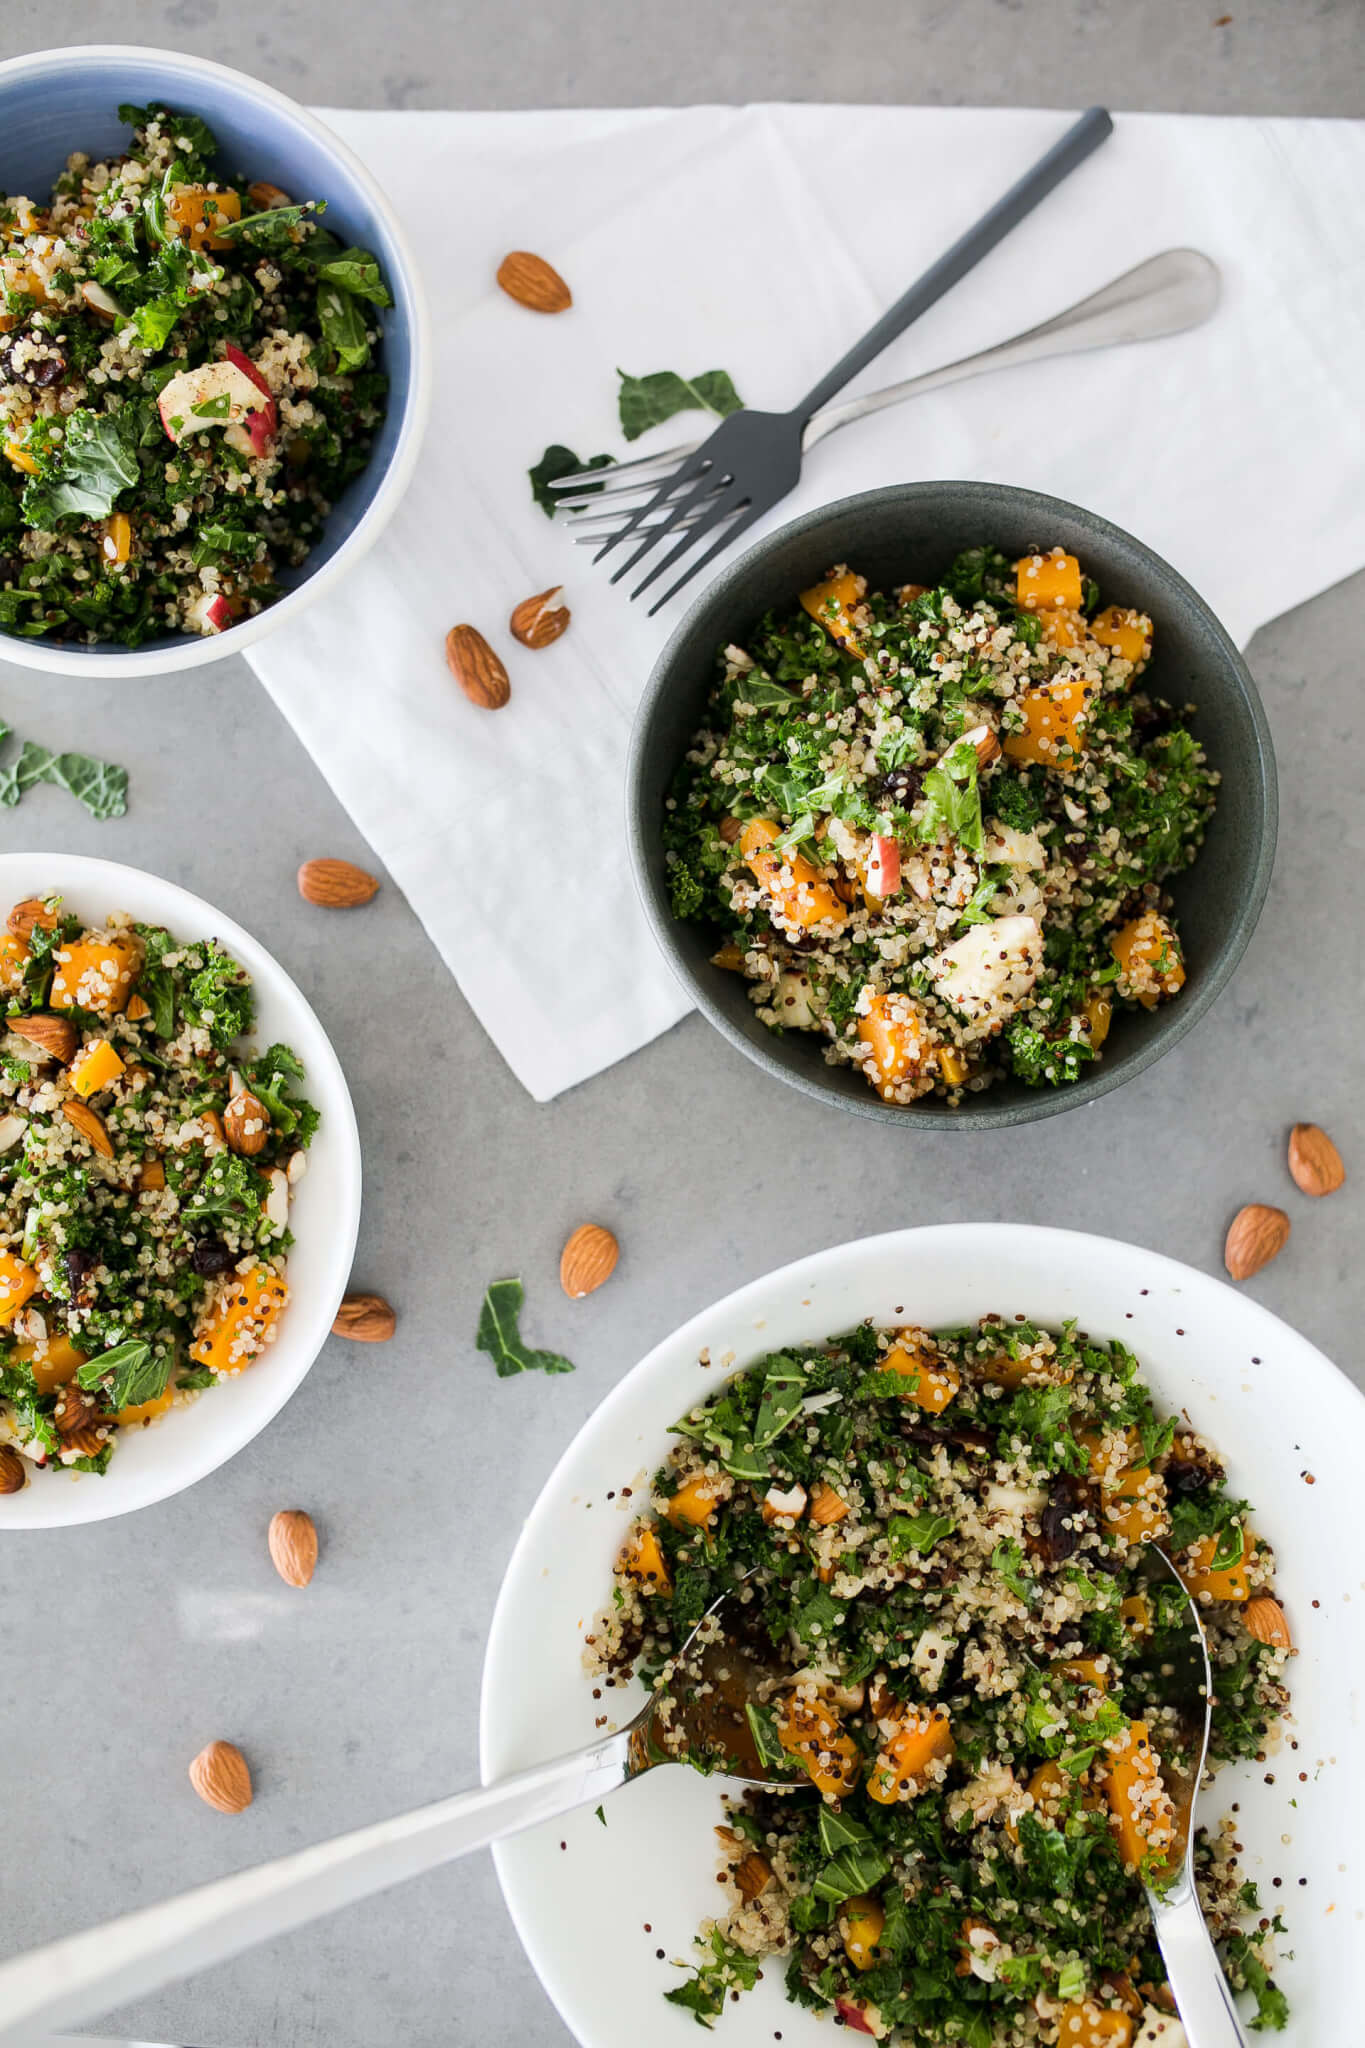 Kale_salad_nathalie's_cuisine